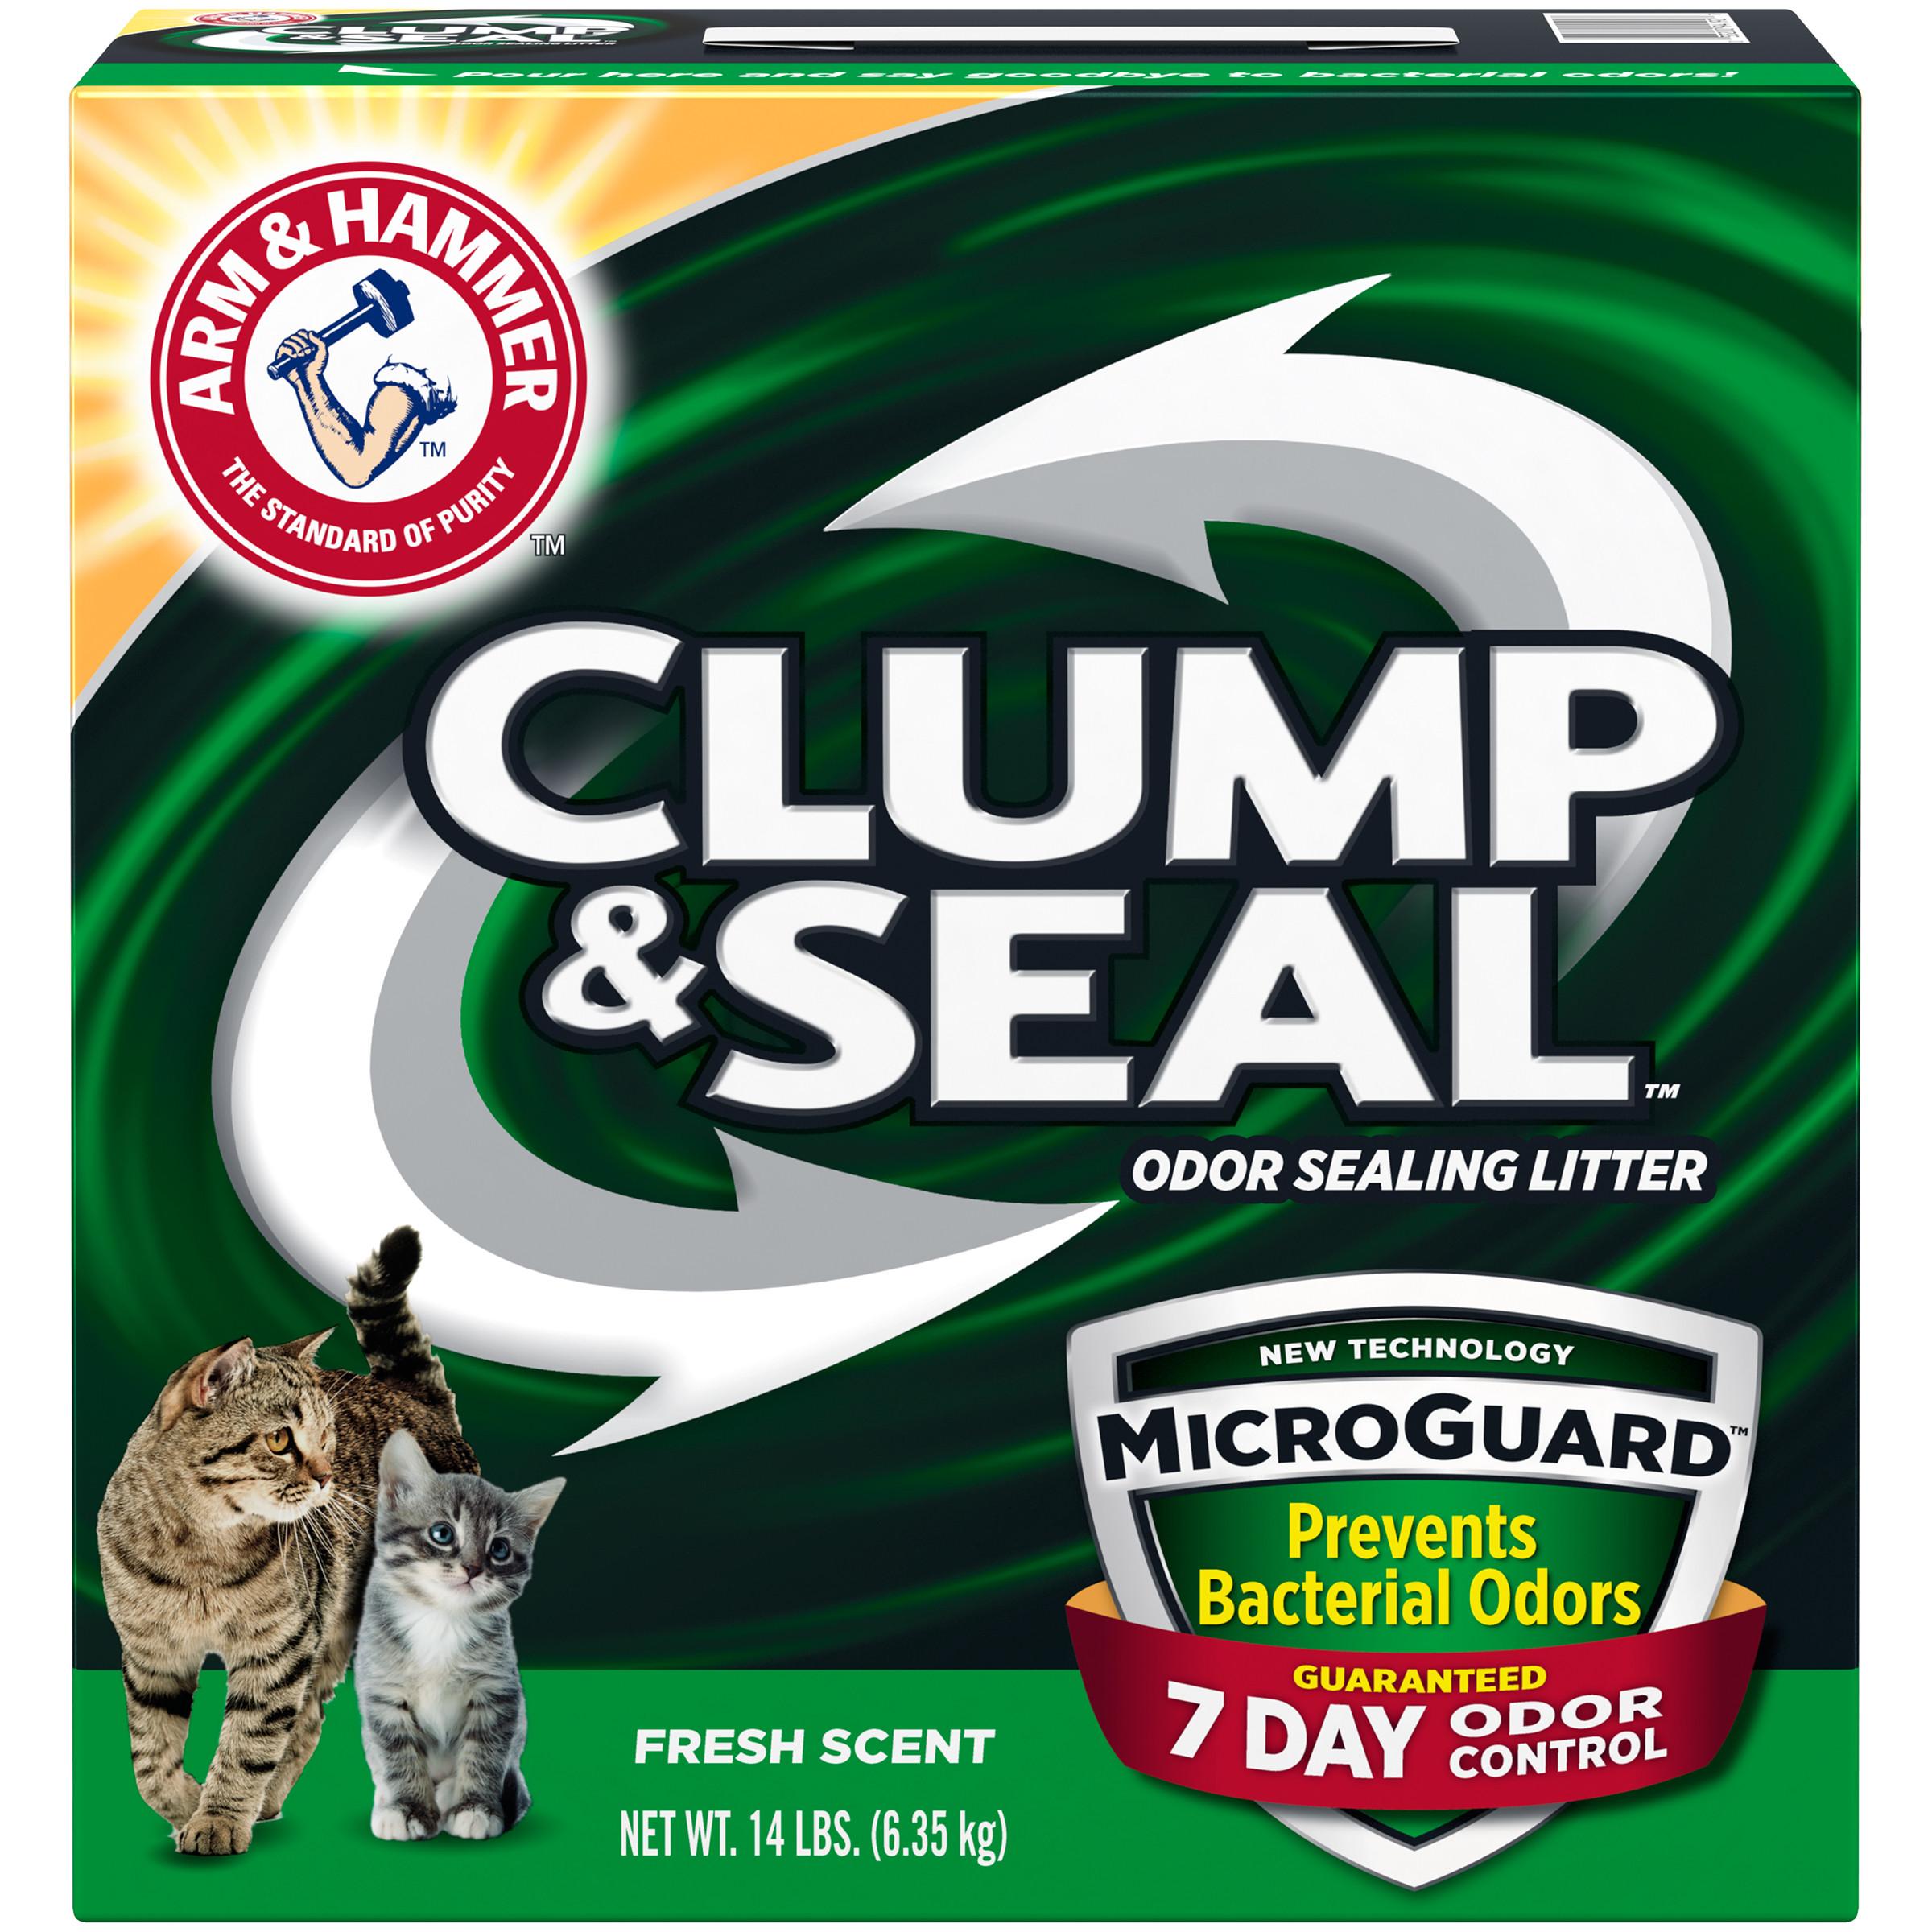 ARM & HAMMER Clump & Seal MicroGuard Litter, 14 lb